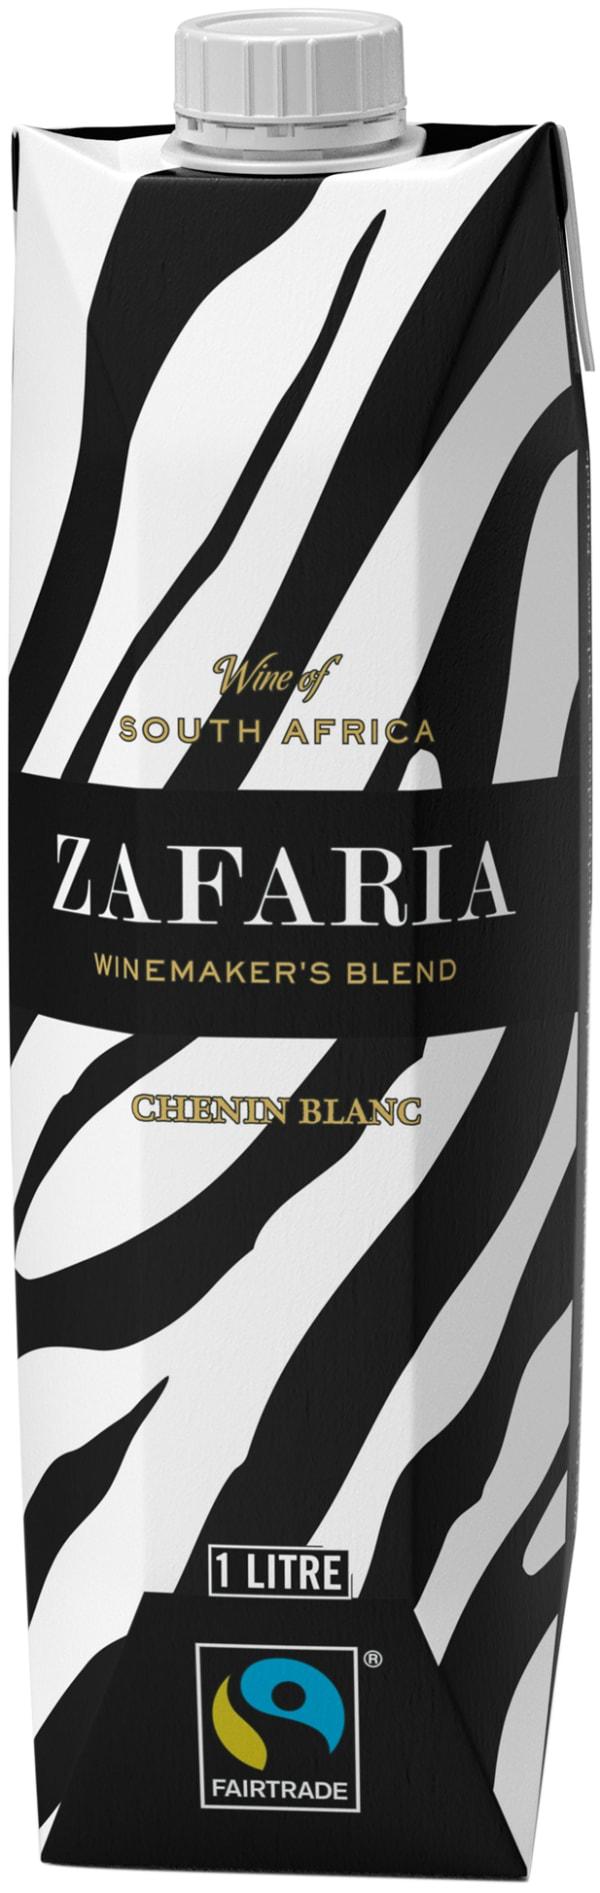 Zafaria Winemakers Blend Chenin Blanc 2019 carton package